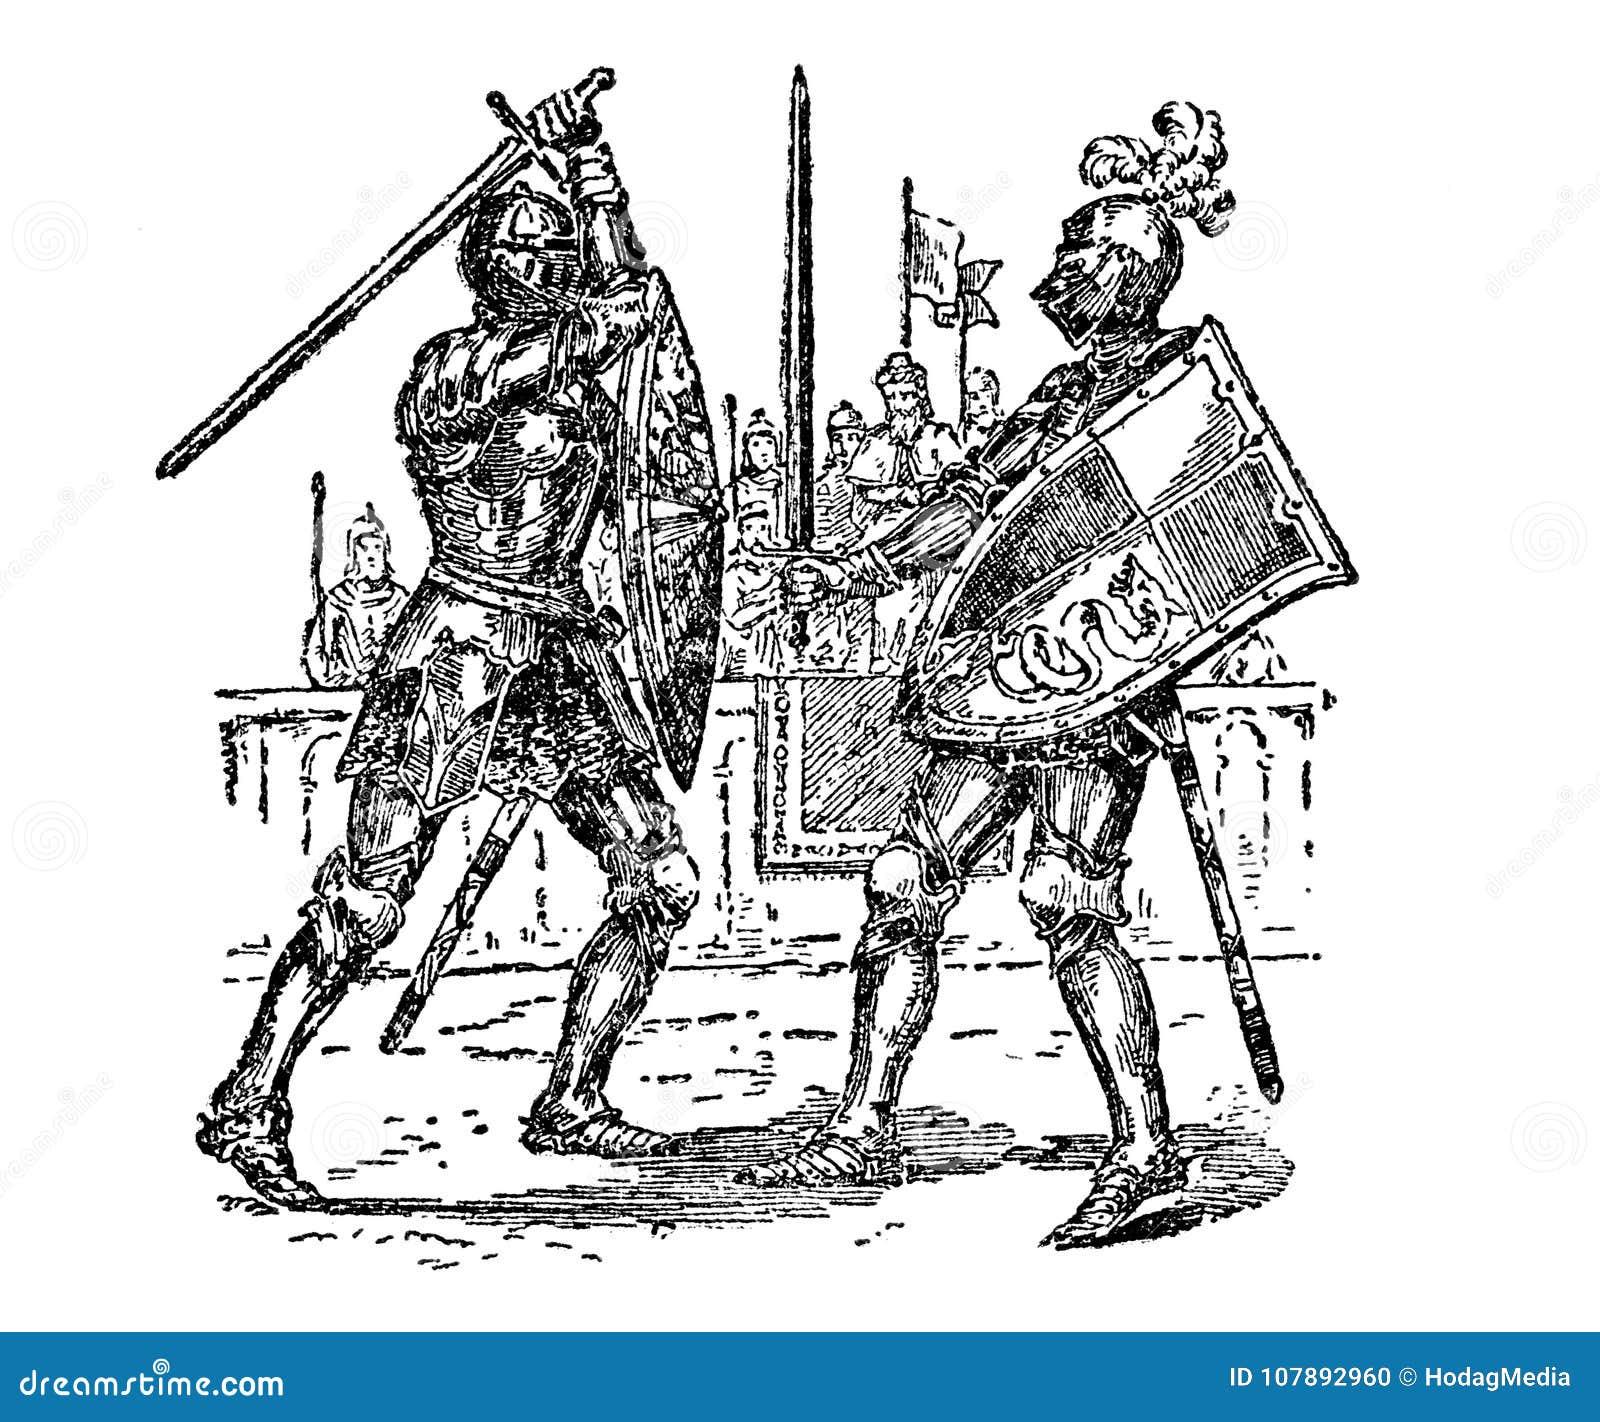 vintage engraved art knights fighting duel stock illustration